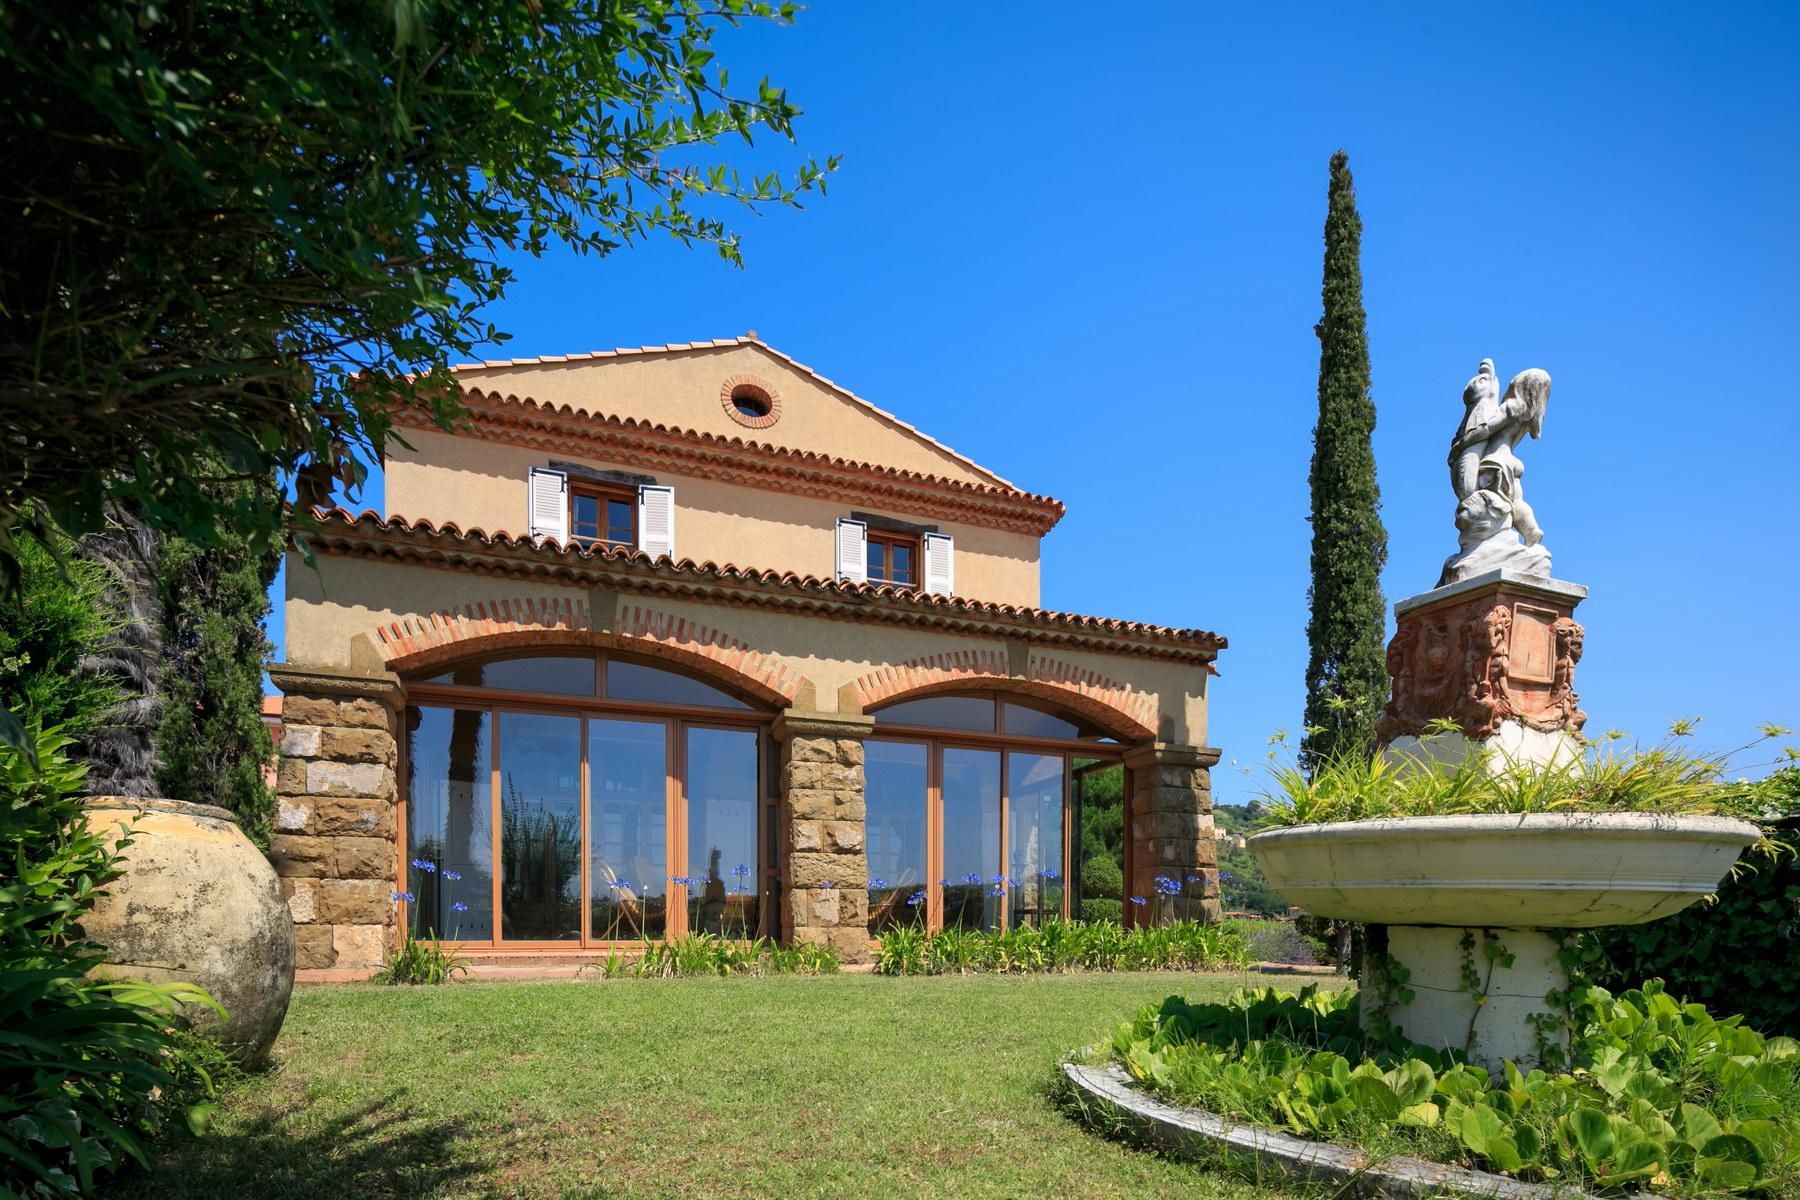 Villa in Vendita a Lerici: 5 locali, 620 mq - Foto 6